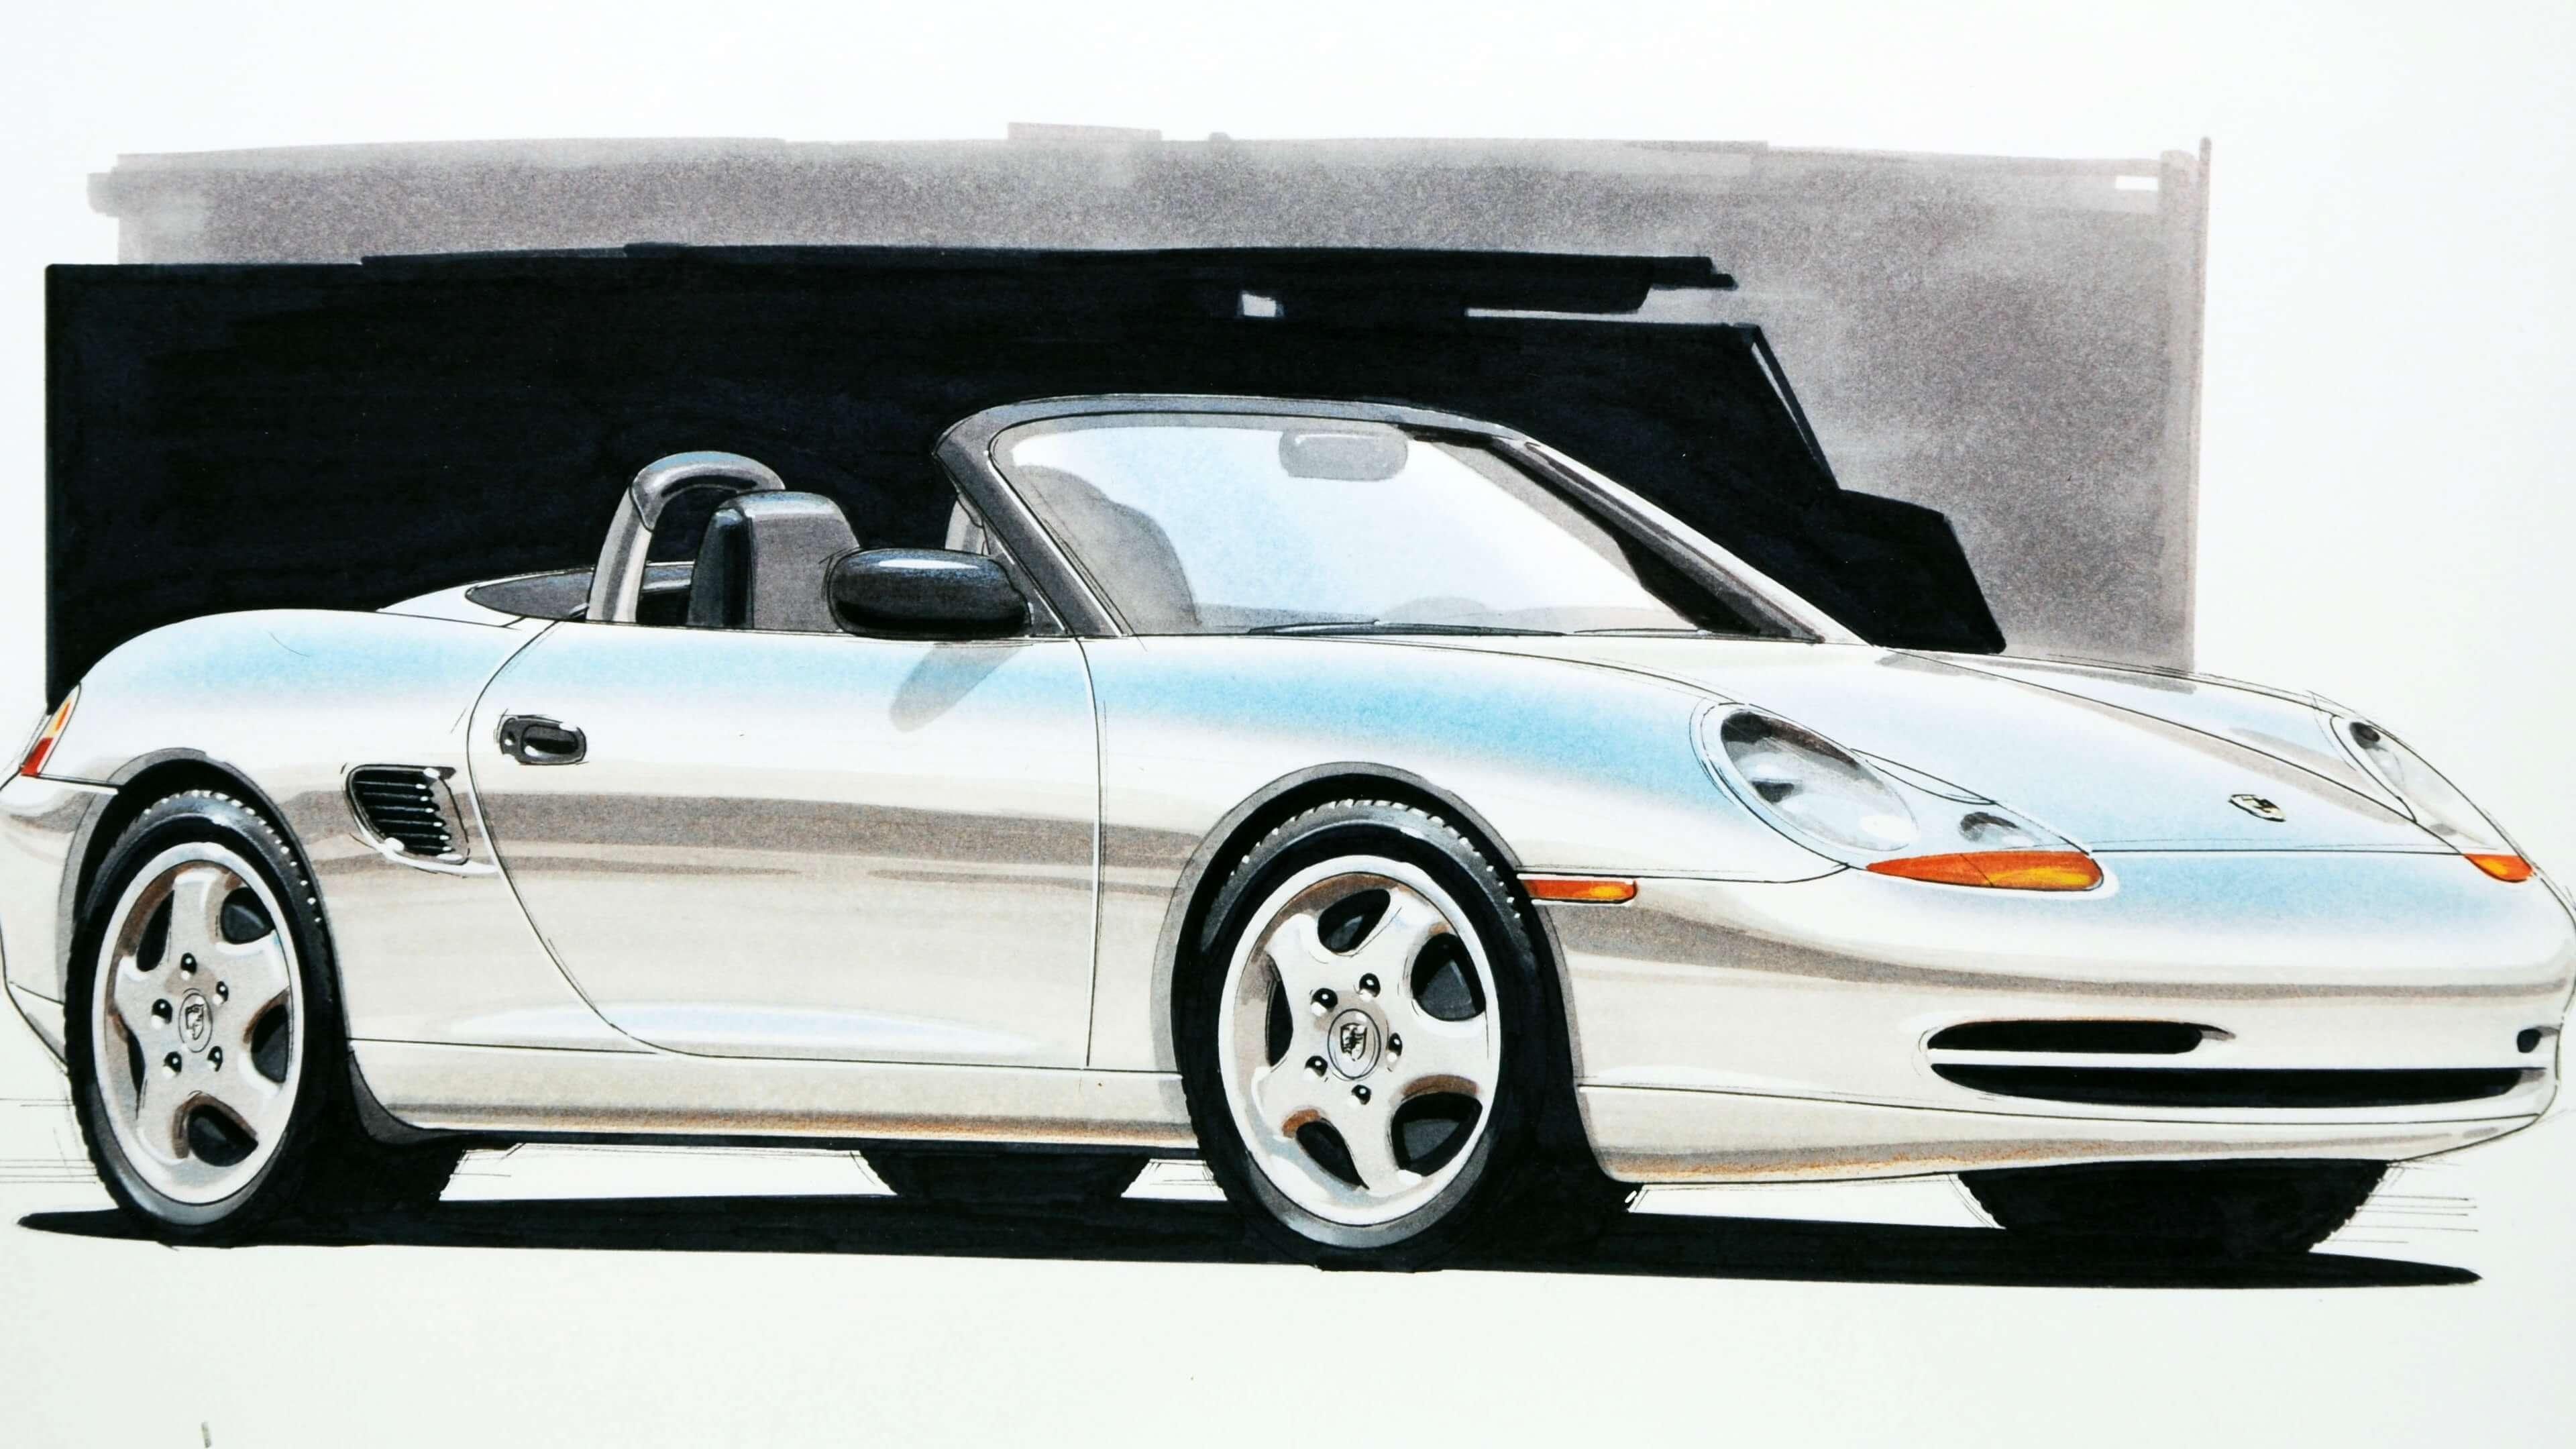 Porsche Boxster 問世 25 周年!一探傳奇中置引擎跑車起源